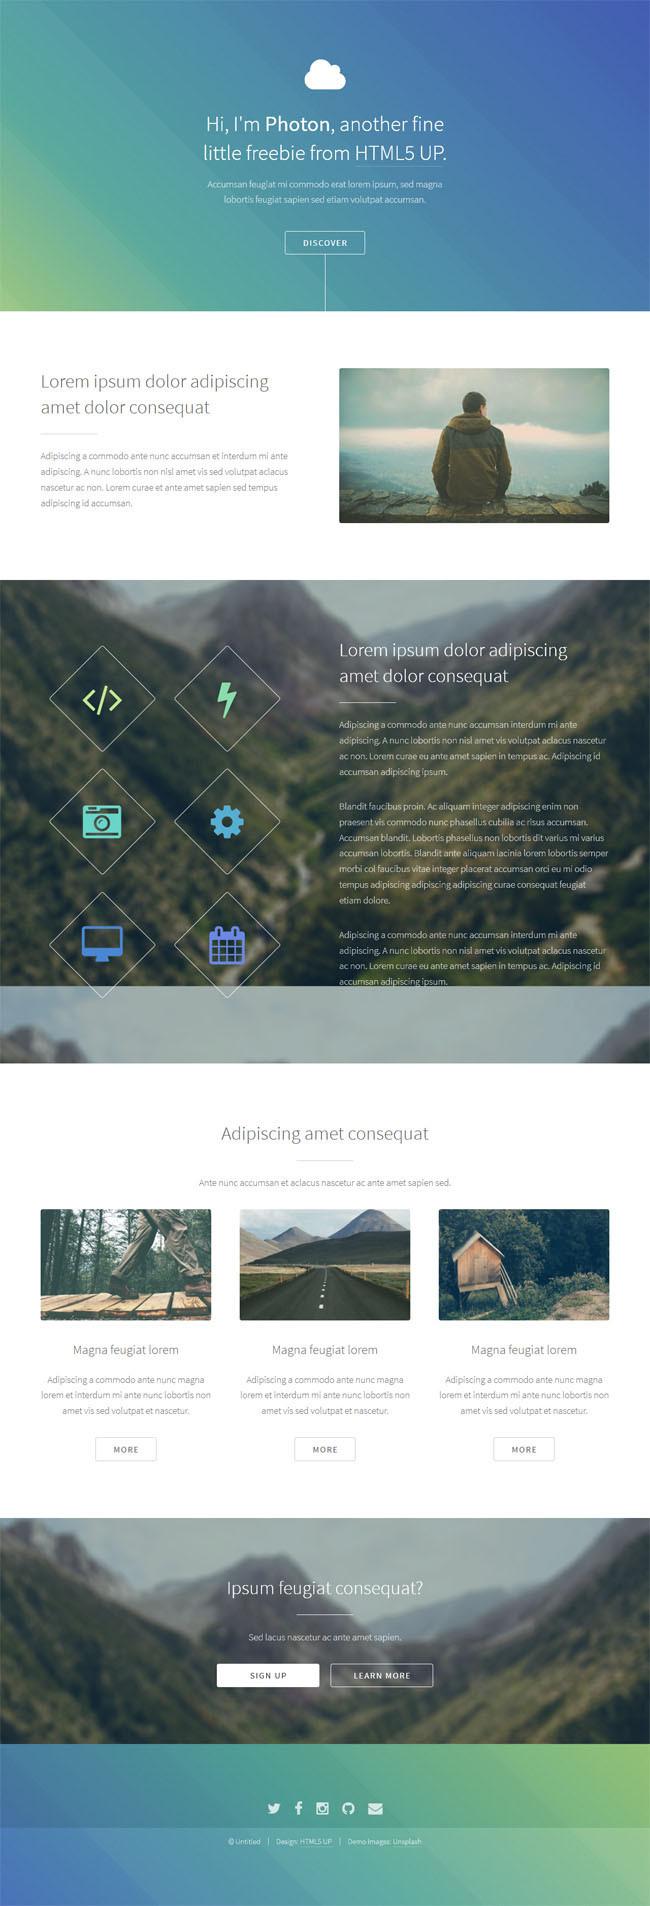 Photon : Free Responsive HTML5 Template